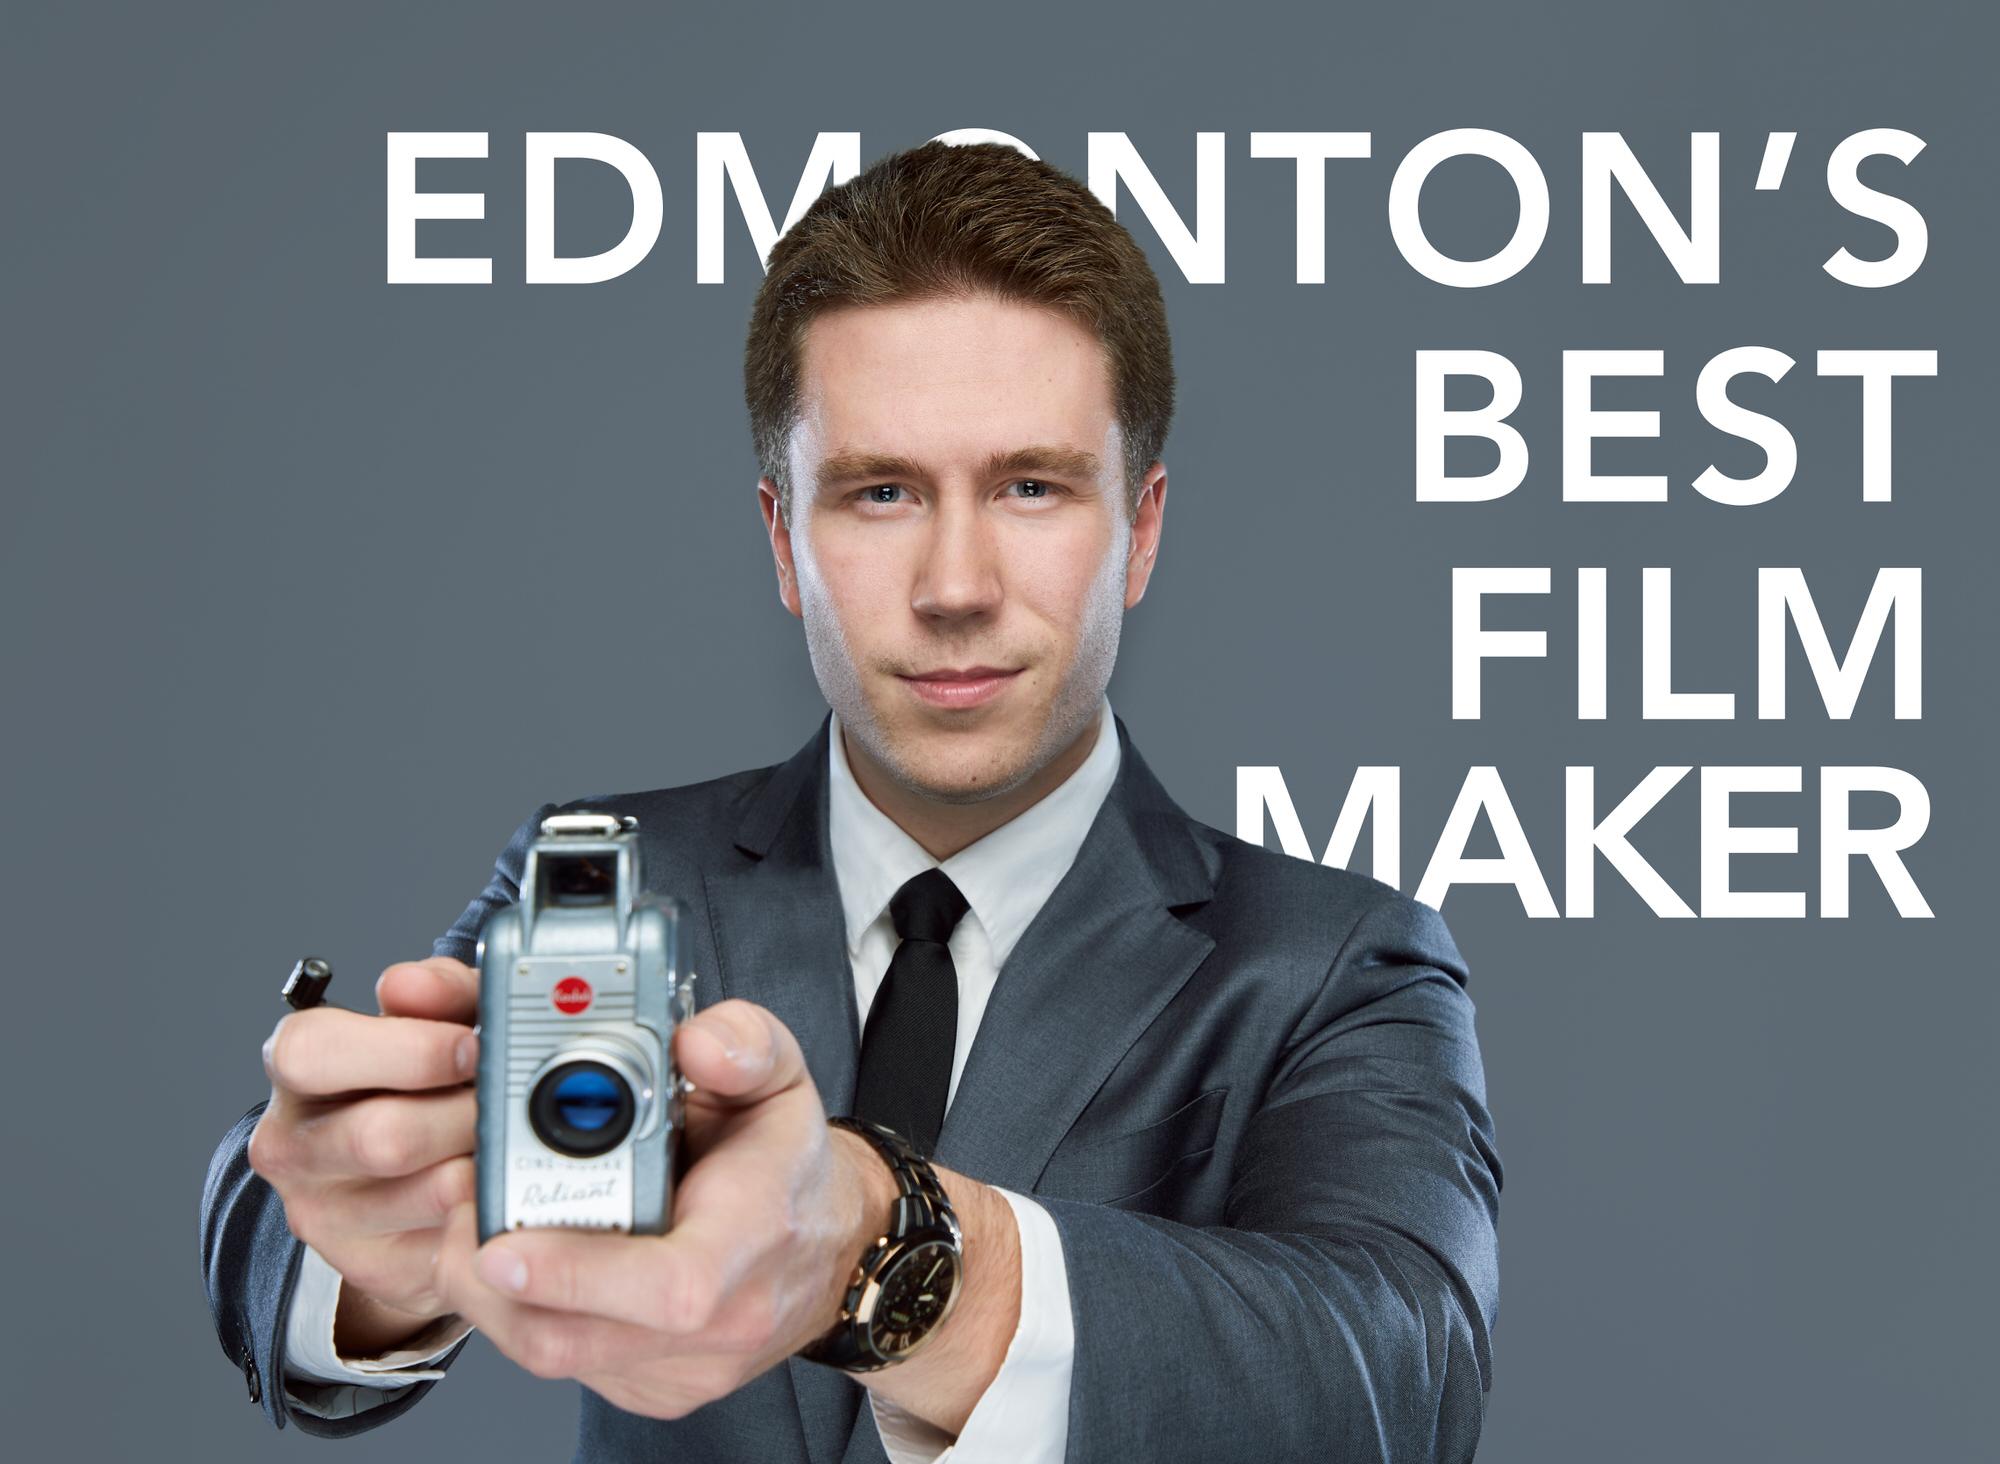 VUE BEST-Film MakerJustin Keuber - Edmonton-commercial-photographer-parker-photo-parkerphoto-ryan-parker-photography-edmonton-portrait-advertising-business-vue-weekly-best-of-edmonton.jpg